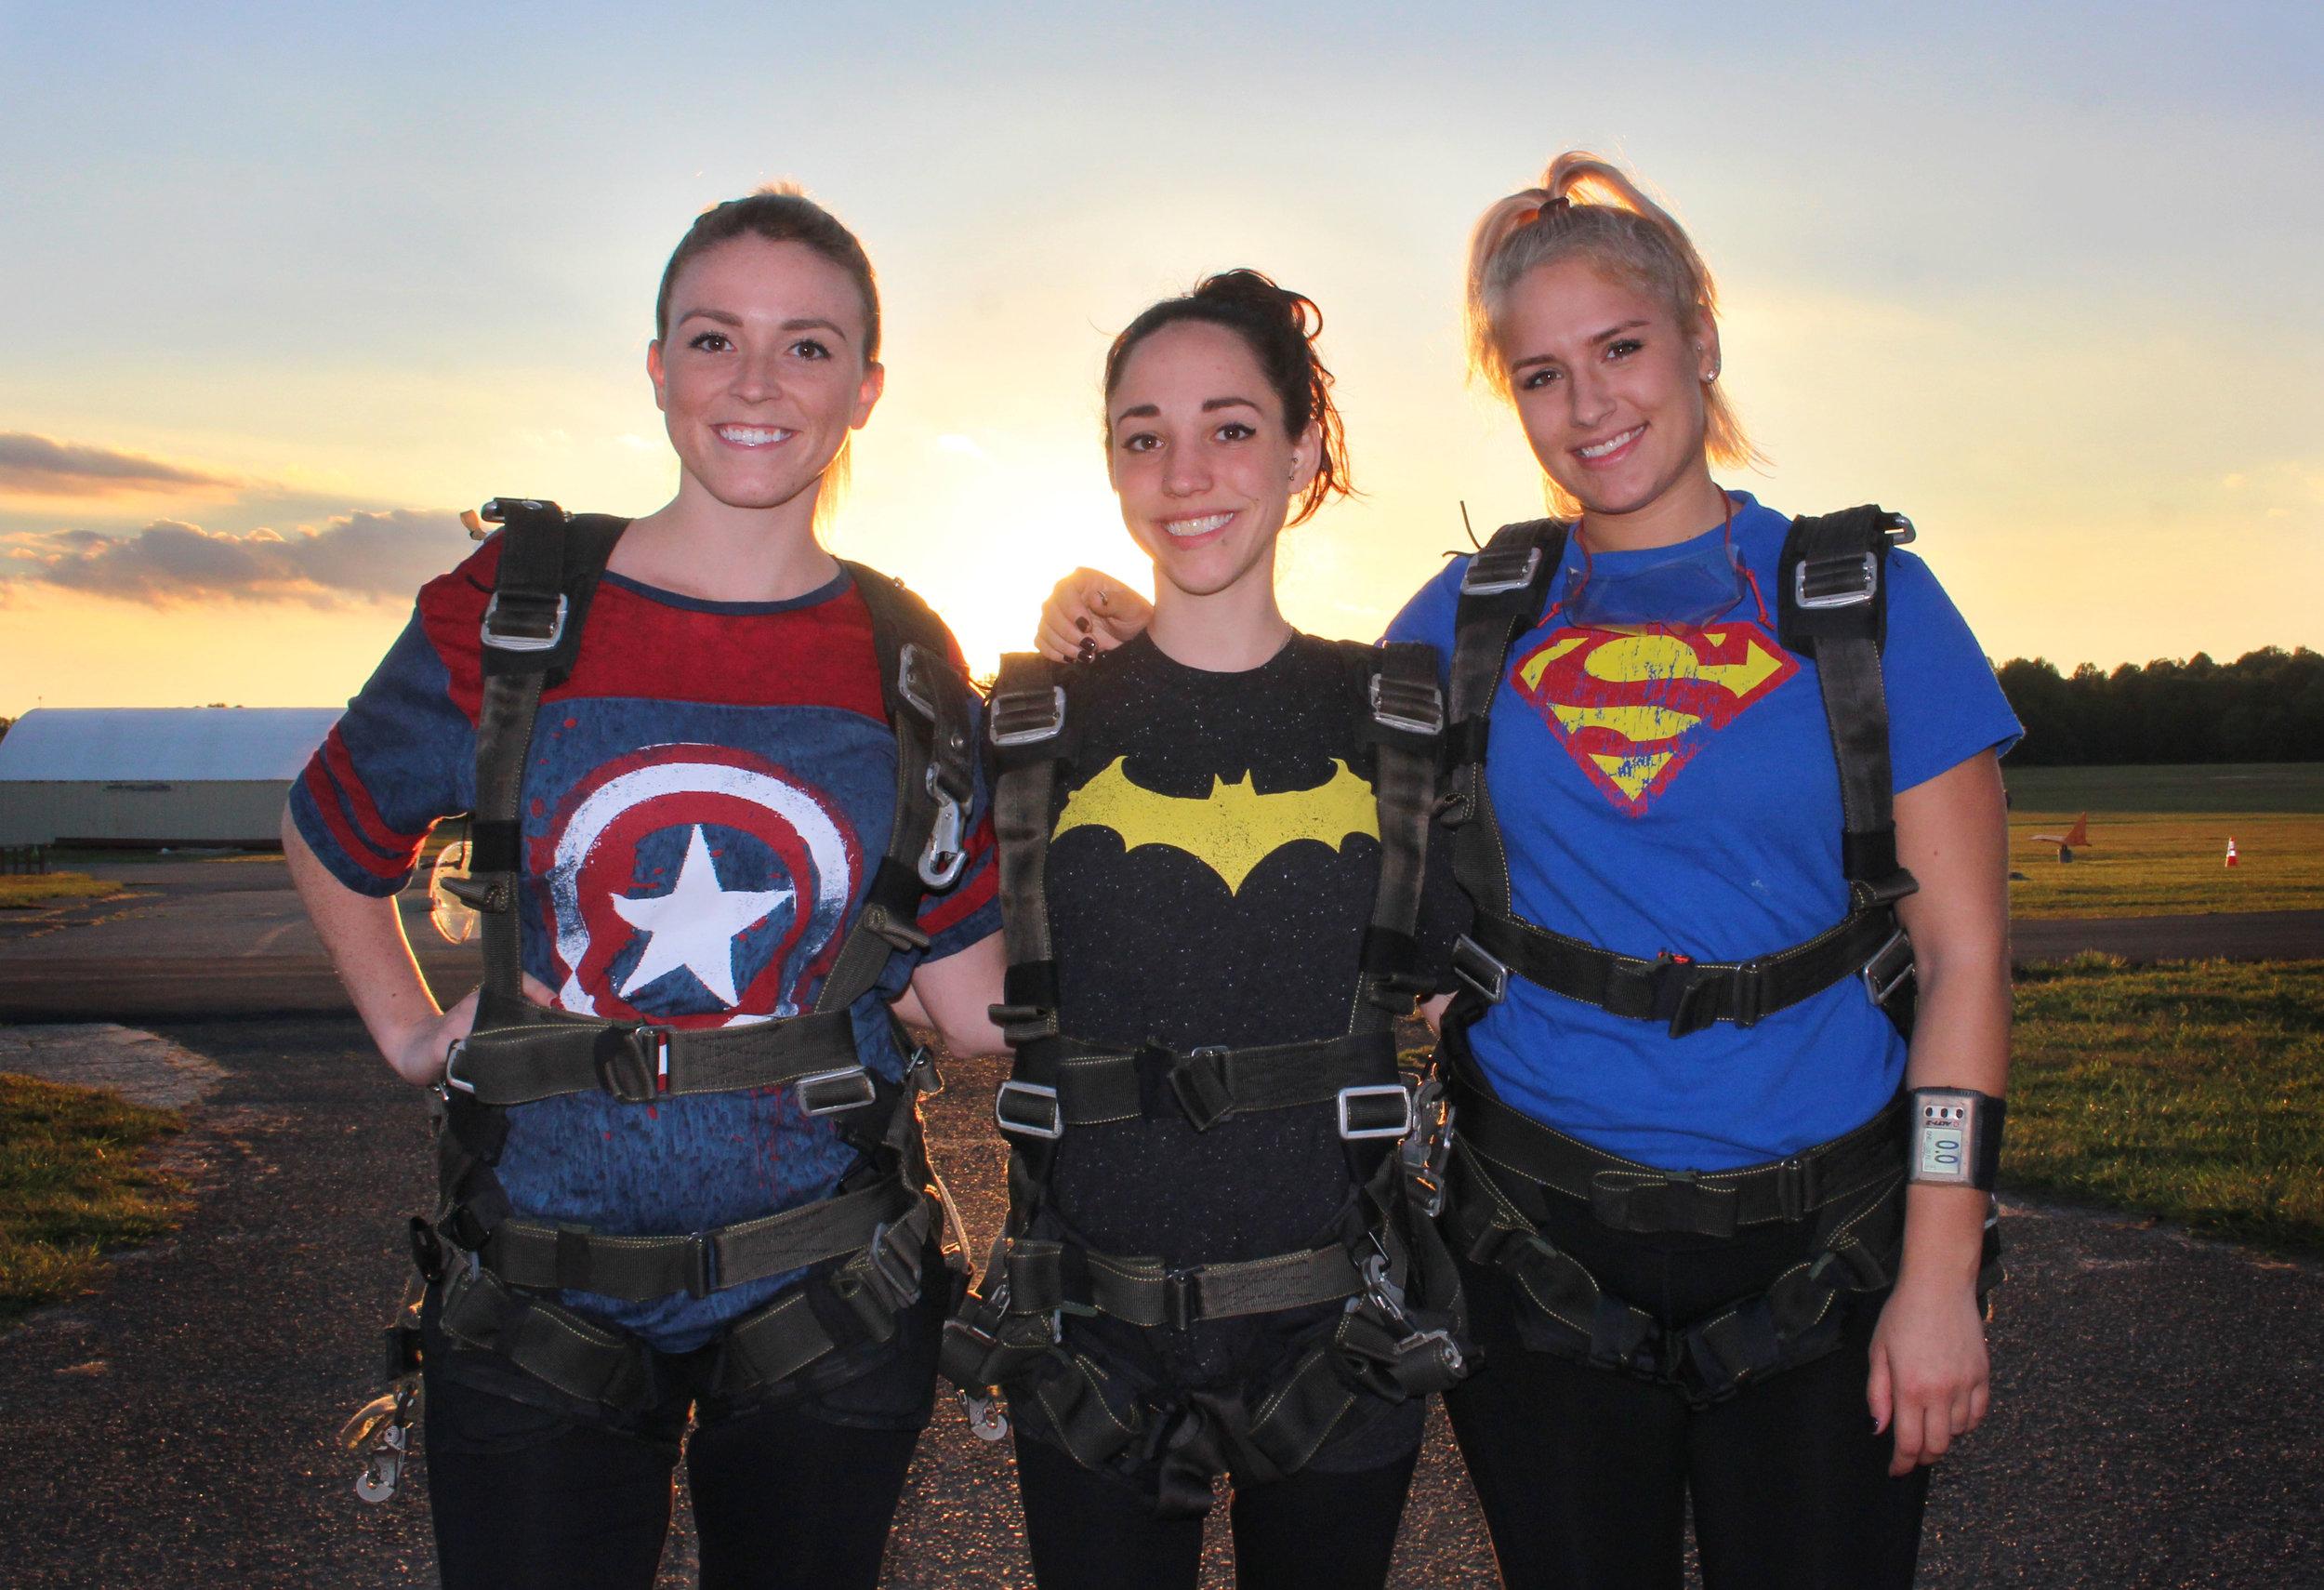 NJ Tandem Skydiving